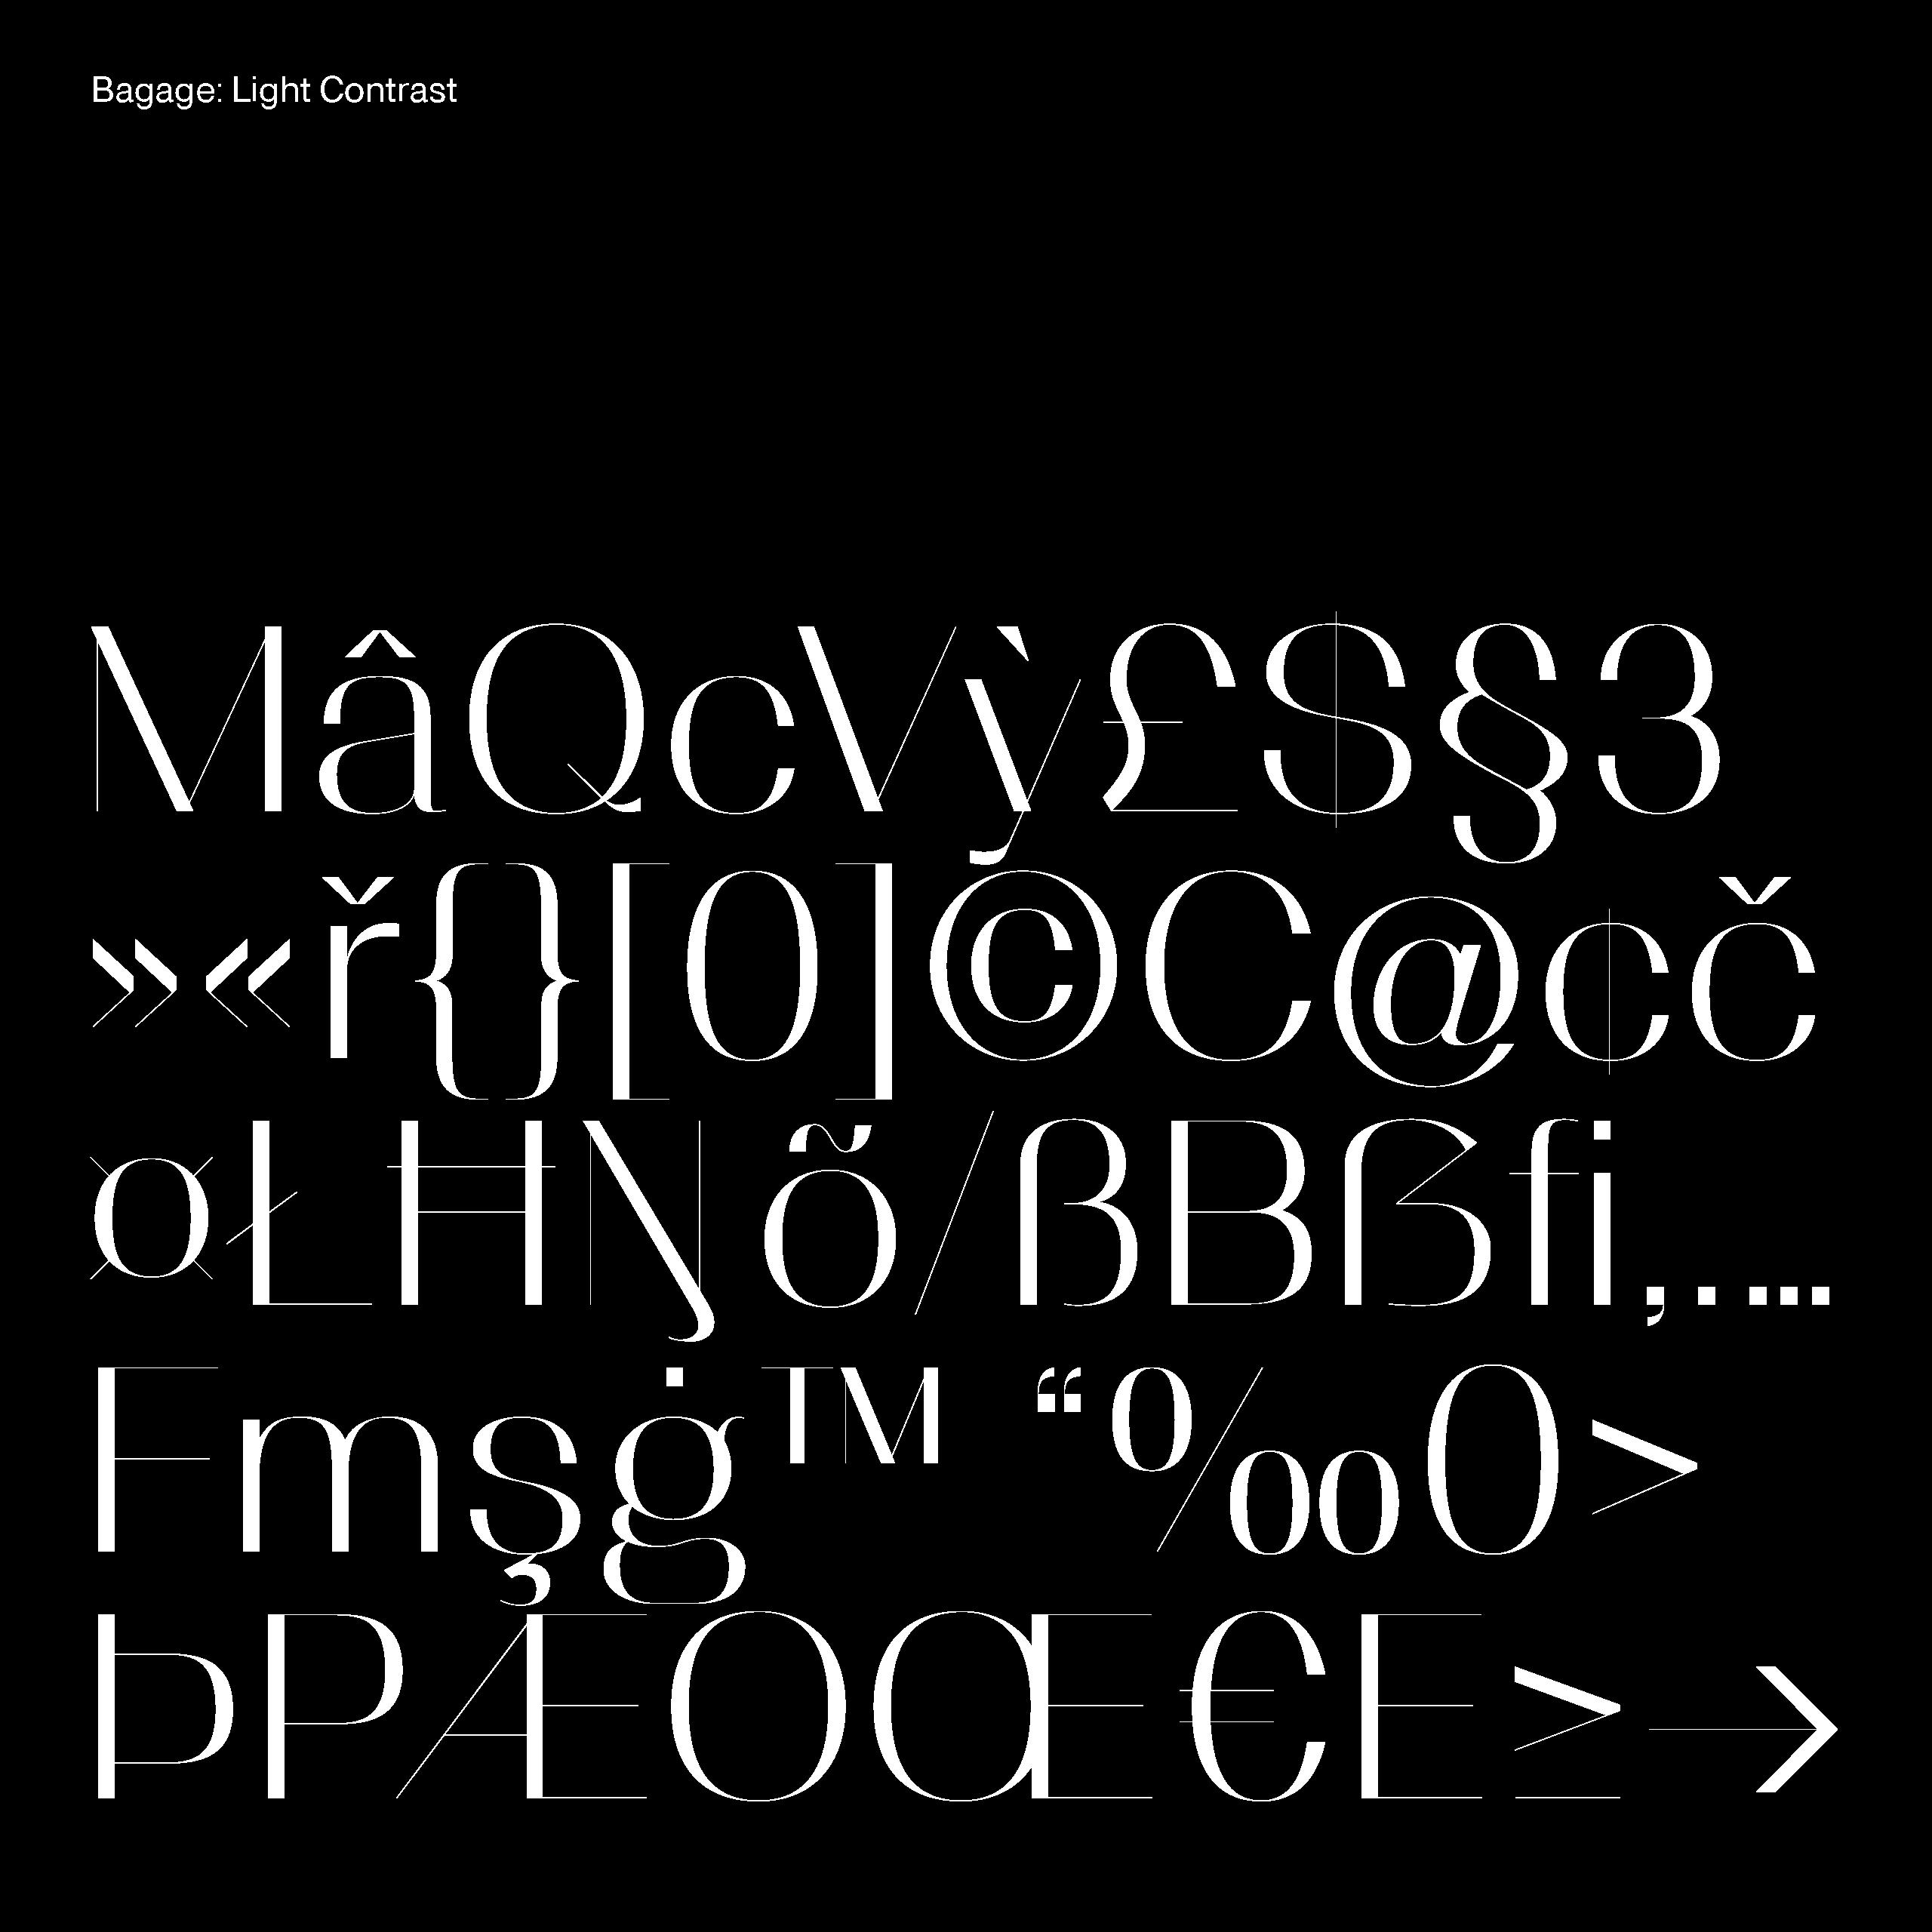 Daniel_Stuhlpfarrer_Spekulative-Schriftgestaltung-Speculative-Type-Design_WEB24